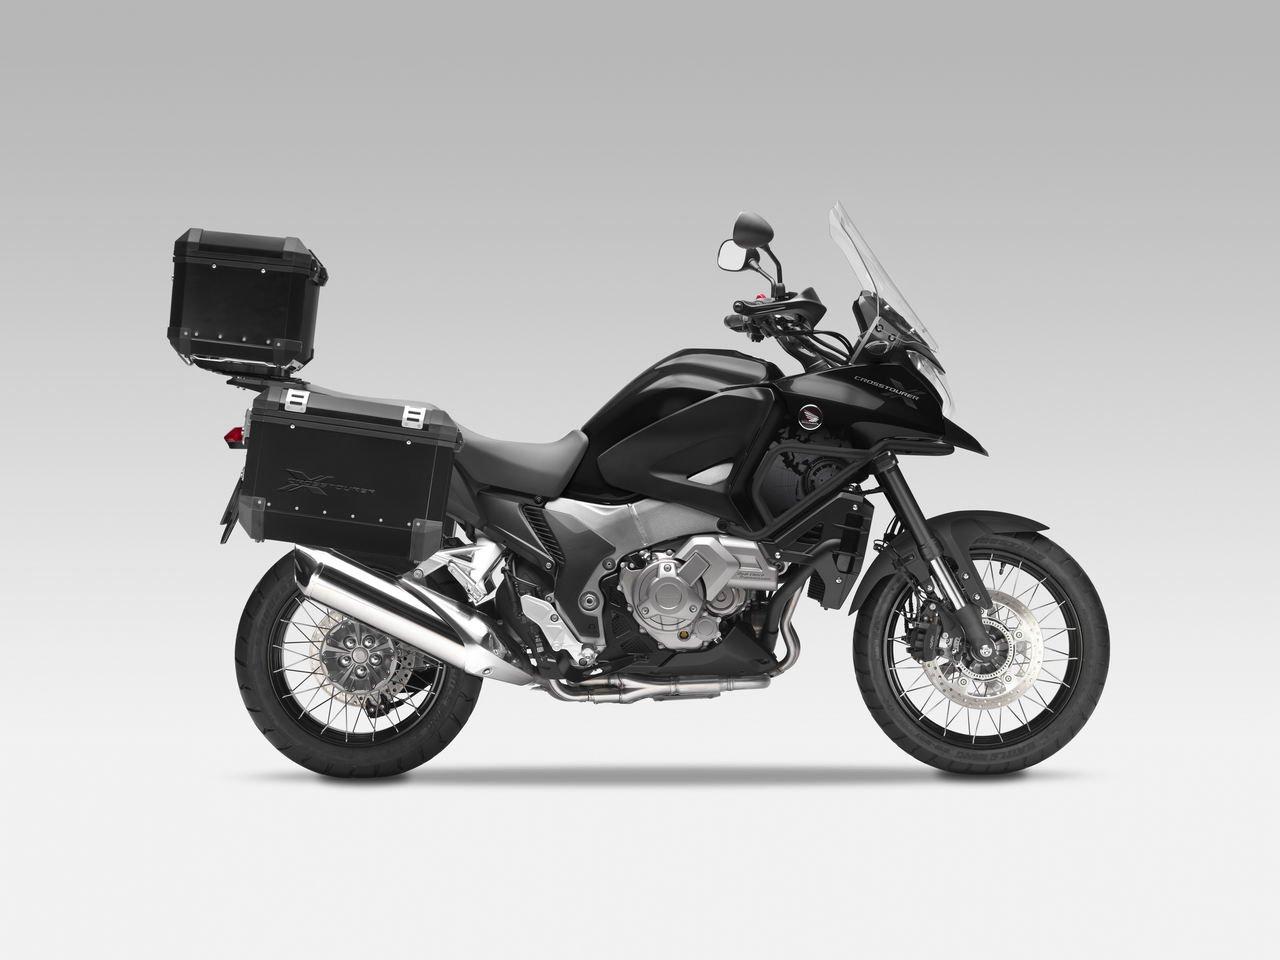 Listino Honda Integra 750 ABSS Scooter oltre 300 - image 14674_honda-crosstourerabs-dct-le on http://moto.motori.net